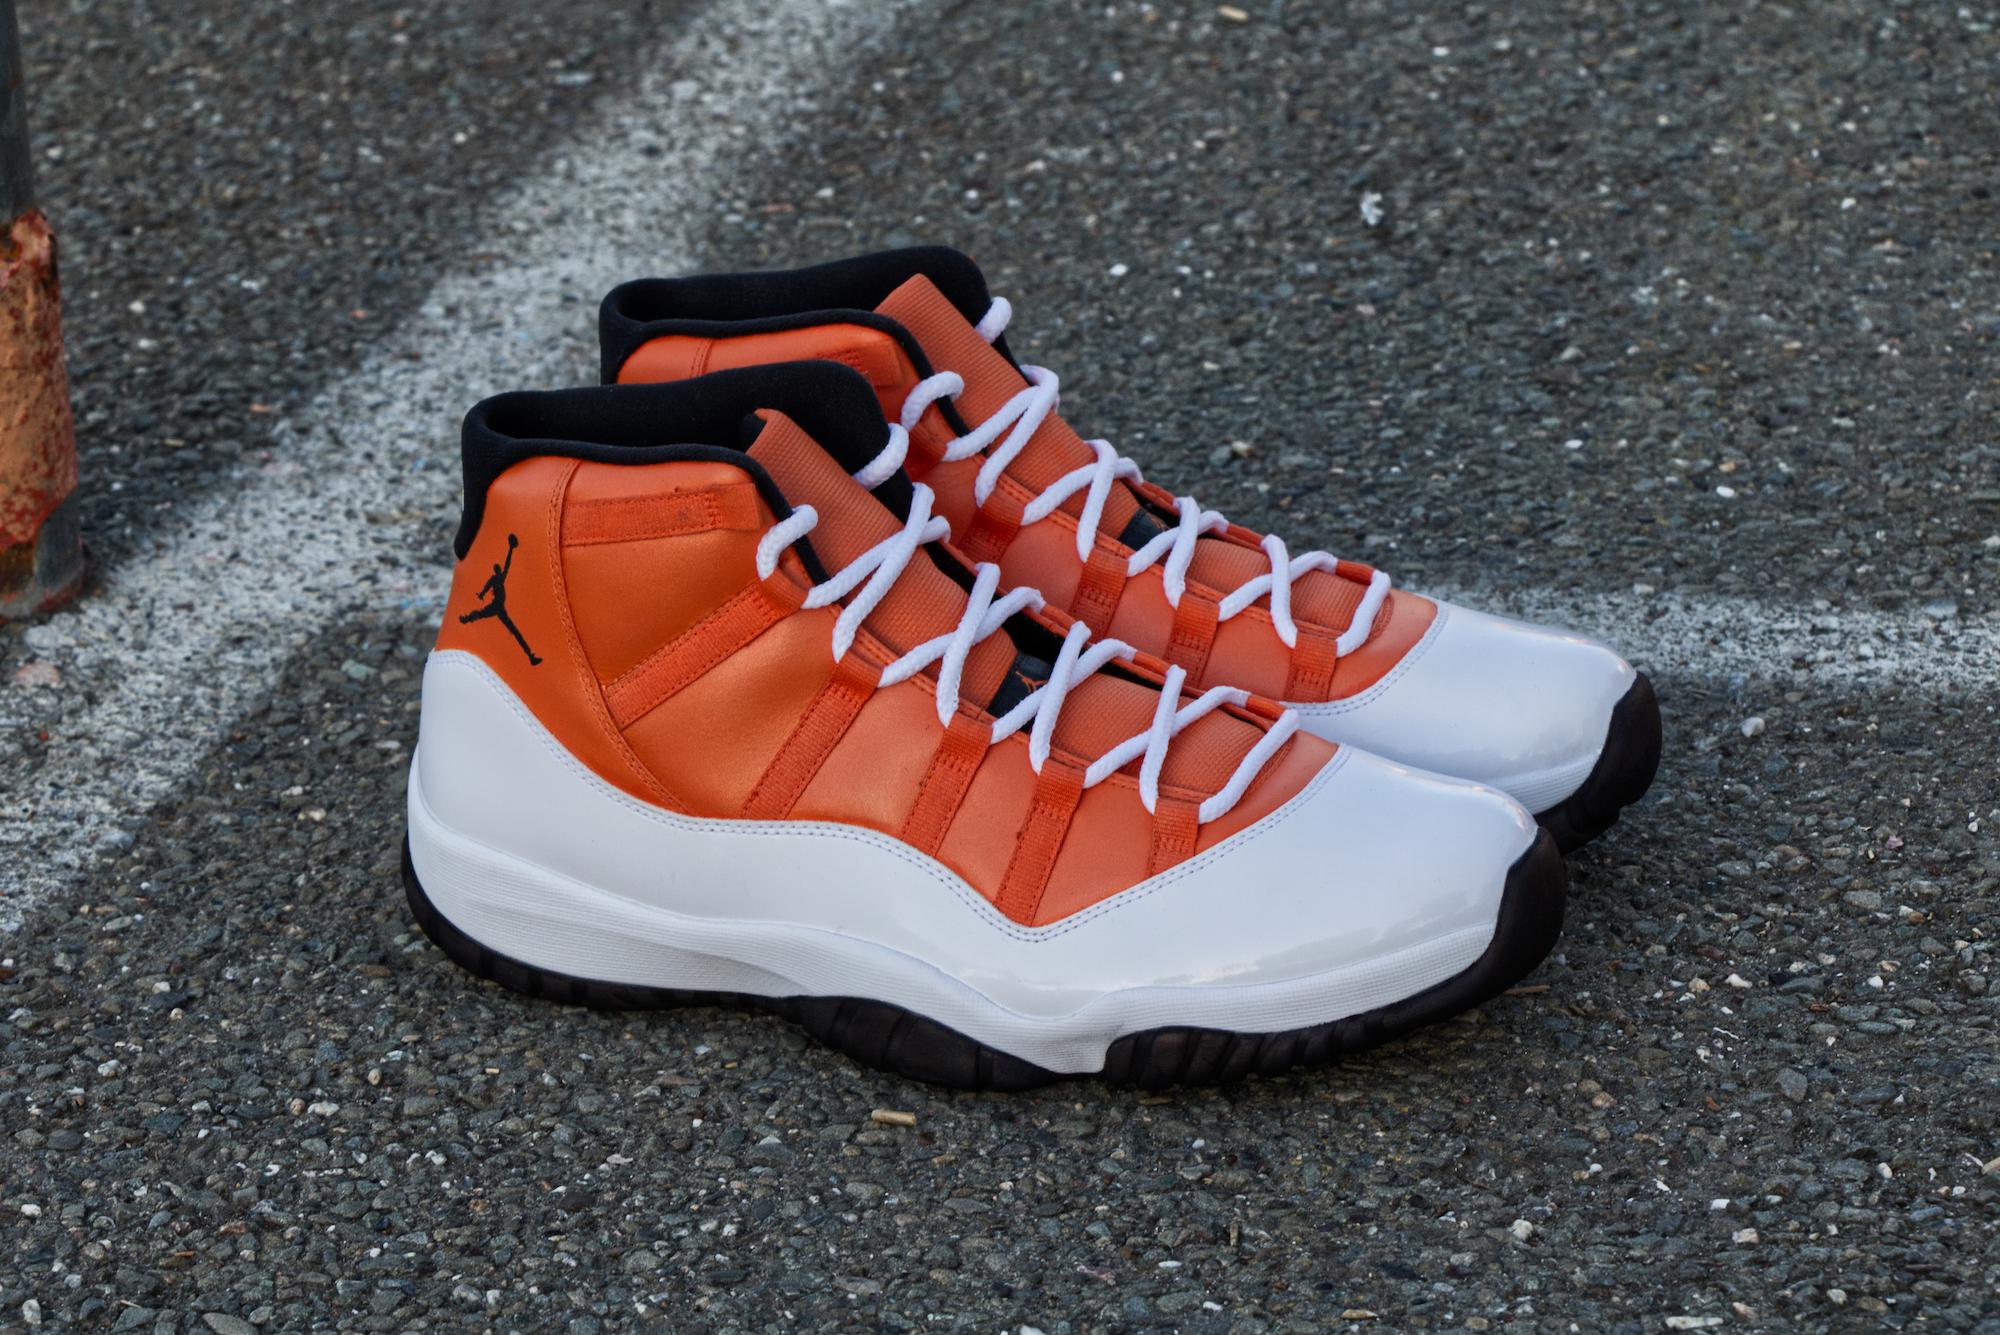 Shattered Backboard Nike Air Jordan 11